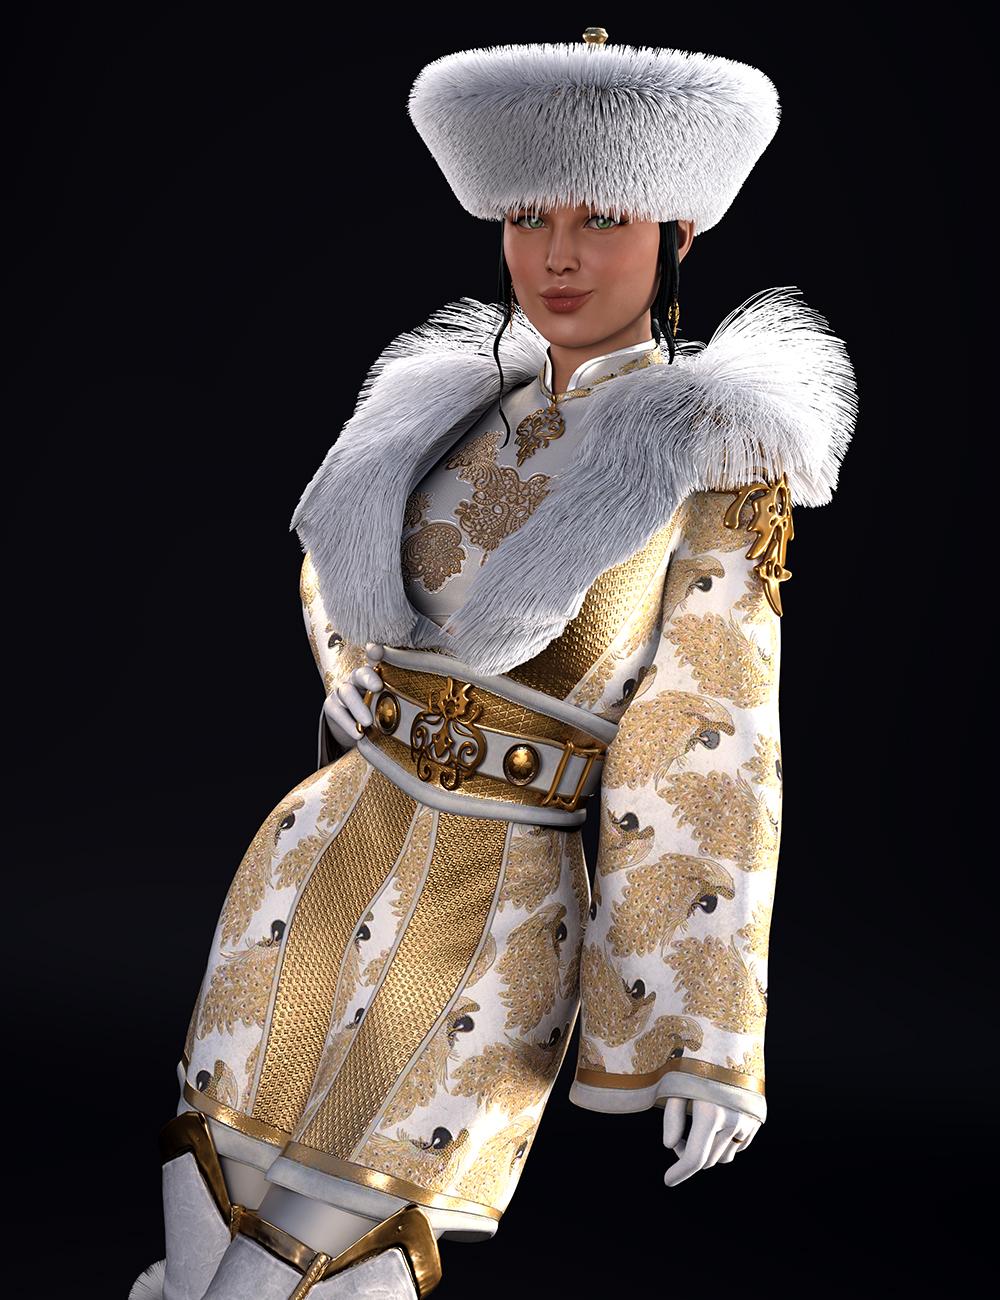 dForce Sujin Imperial Fantasy Outfit for Genesis 8 Females by: Val3dart3D Sugar, 3D Models by Daz 3D